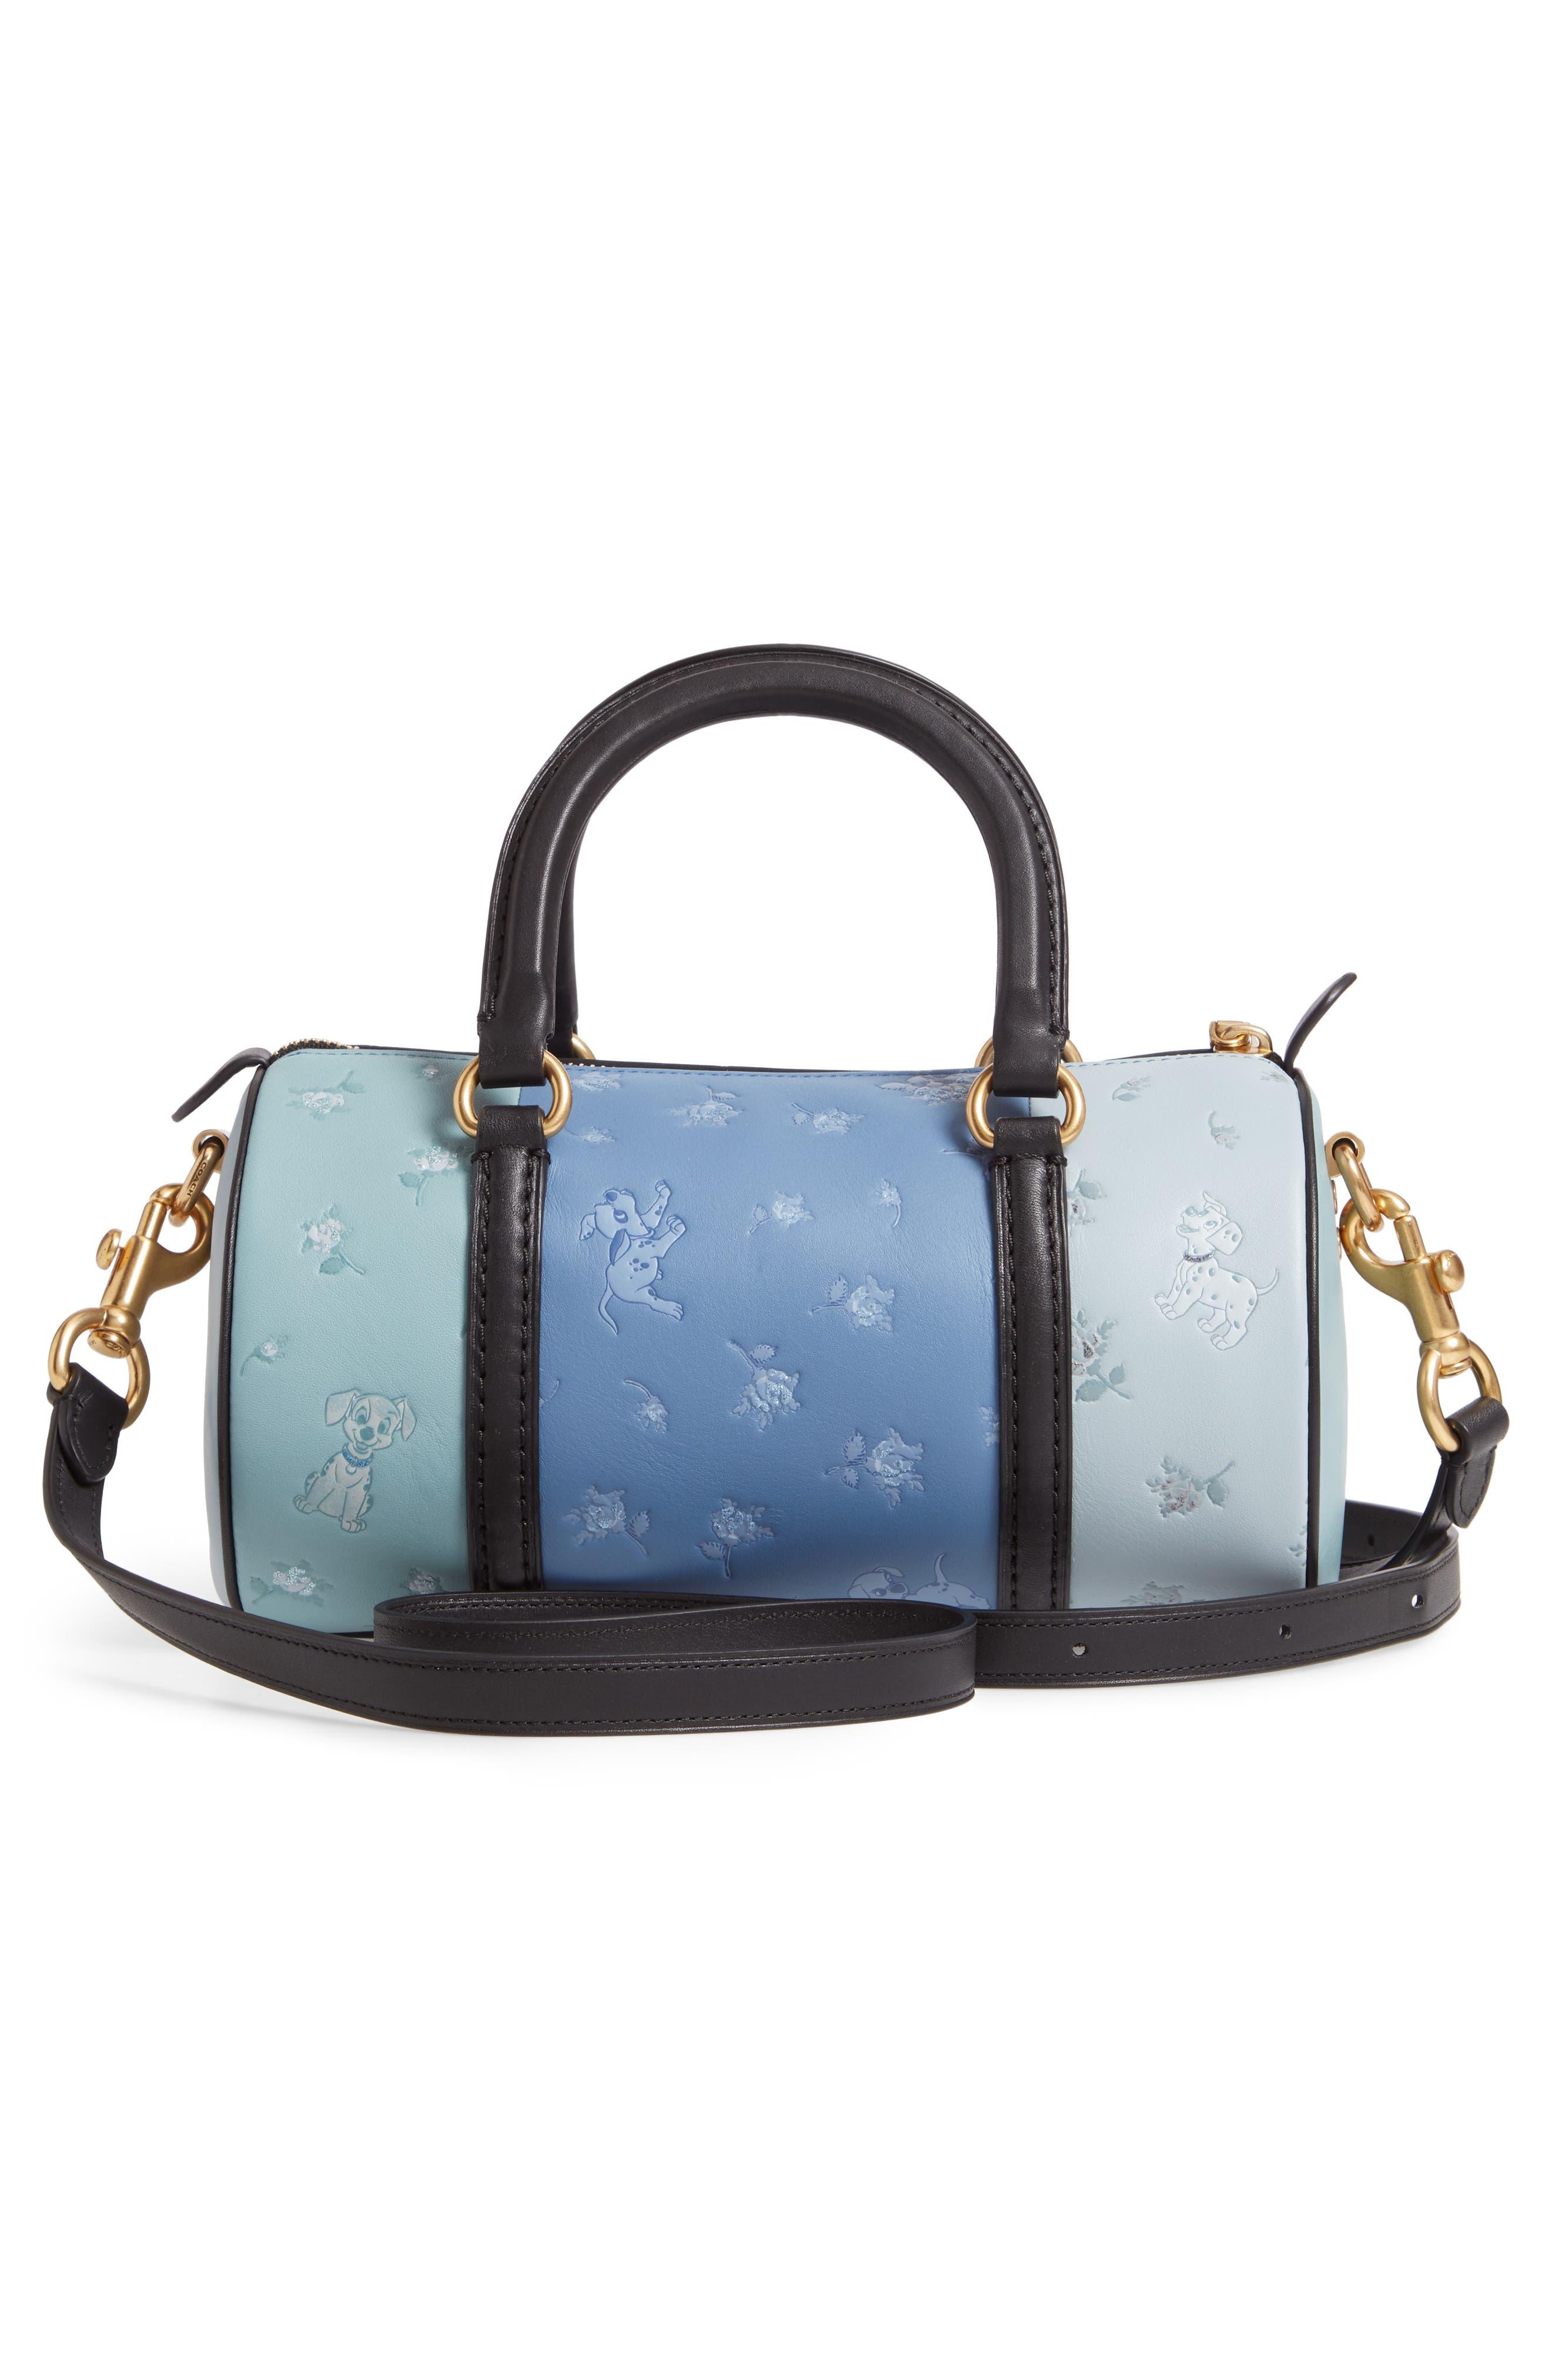 Disney x COACH 101 Dalmatians Leather Barrel Bag,                             Alternate thumbnail 3, color,                             402